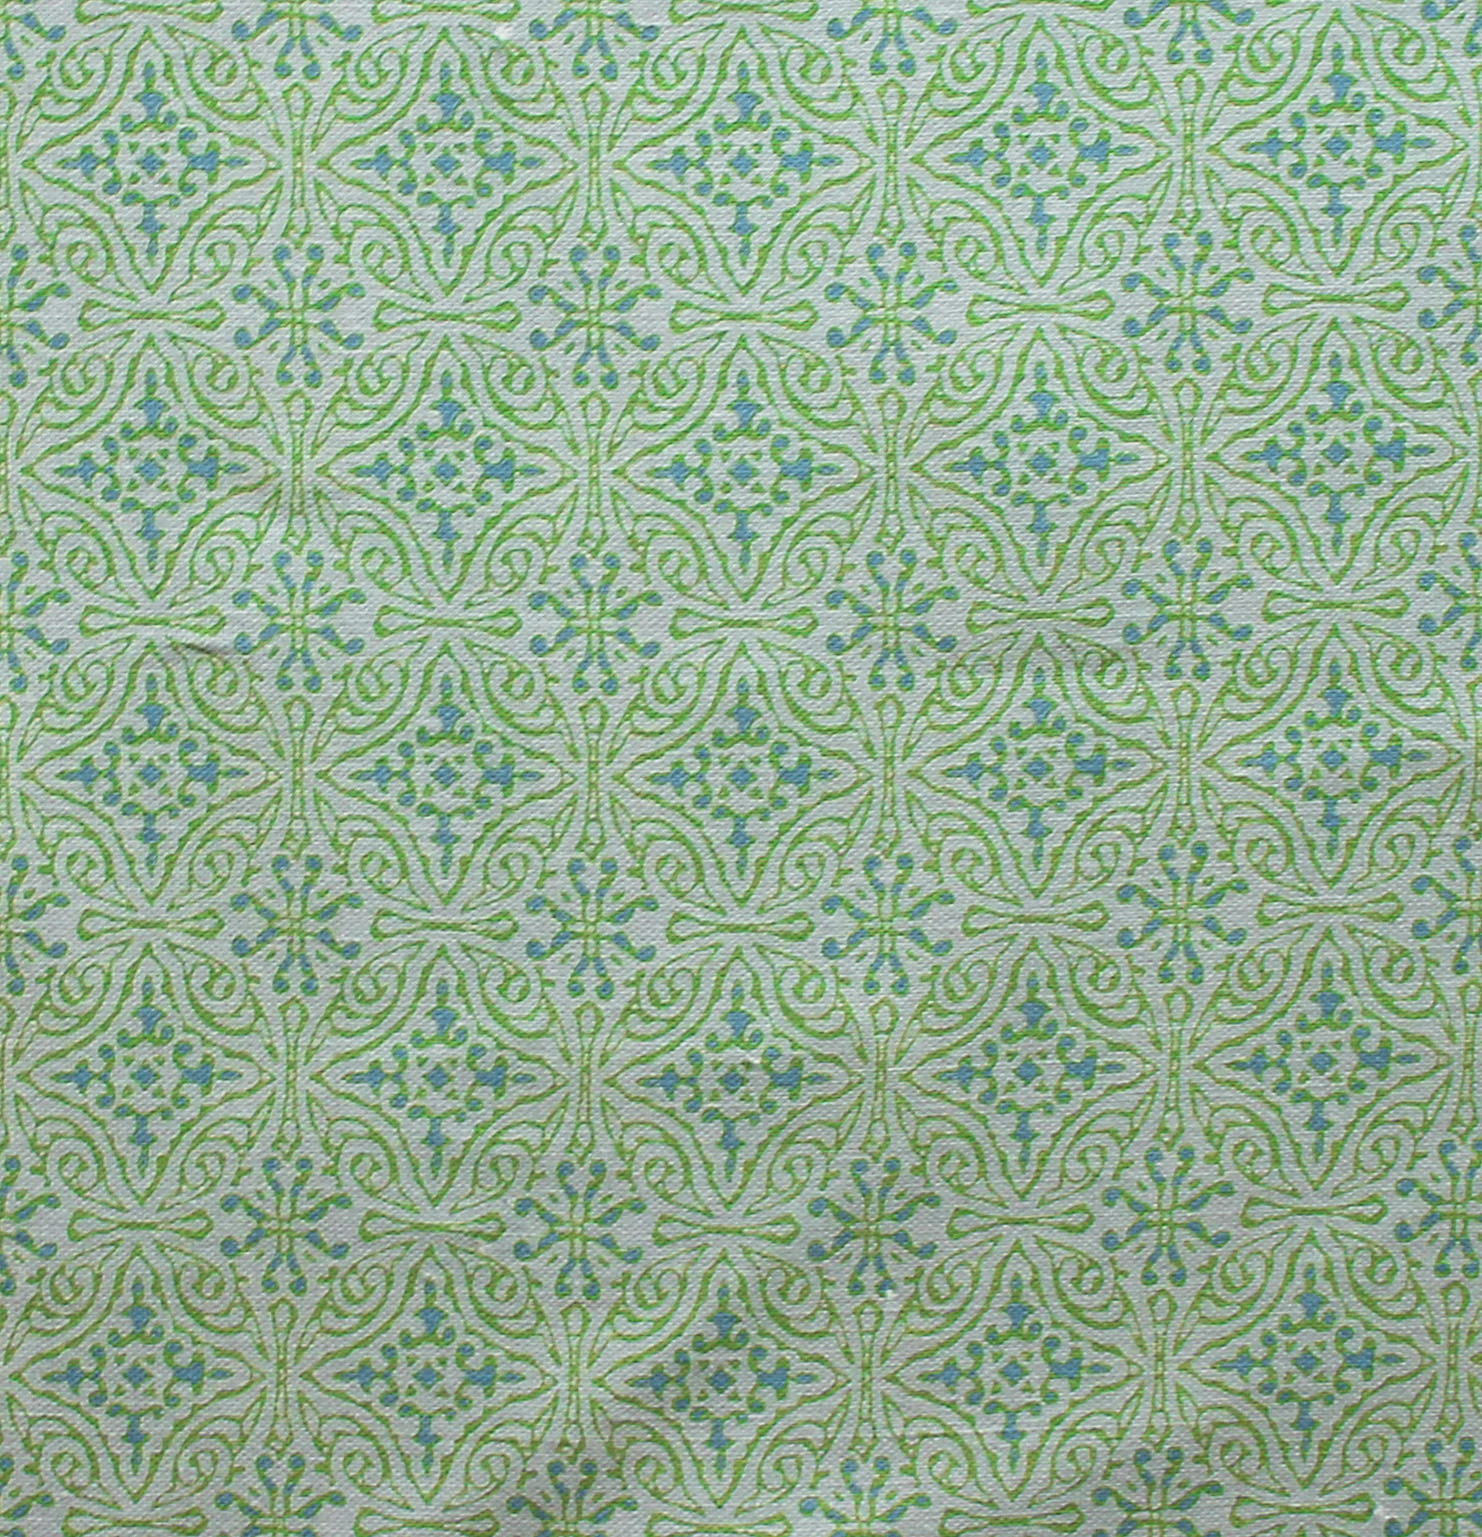 Small Diamond Batik: Green